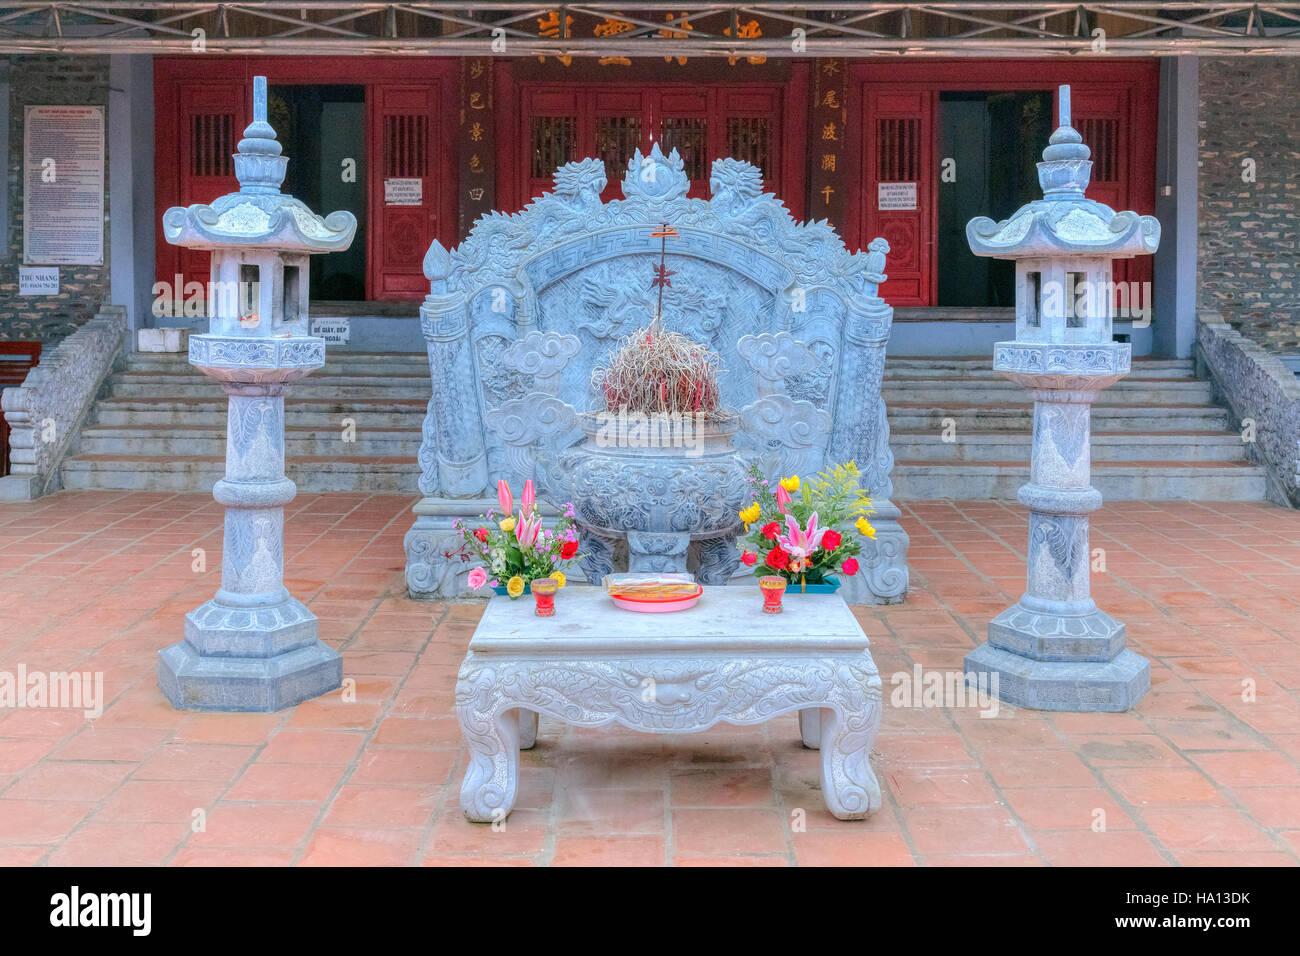 Buddhism temple in Sapa, Lao Cai, Vietnam, Asia - Stock Image